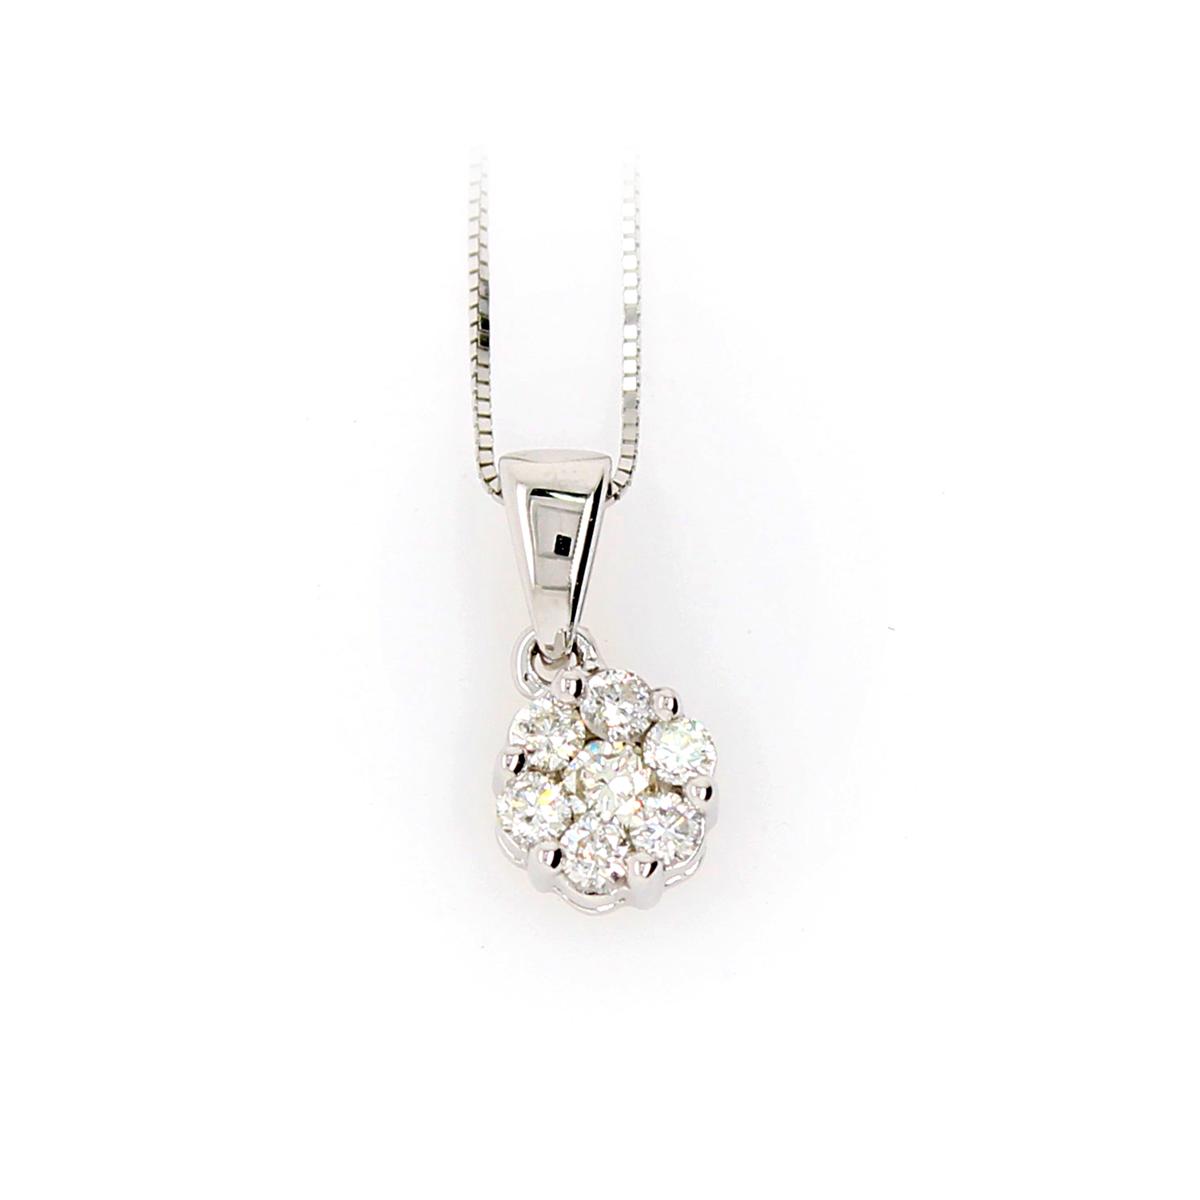 Shefi Diamonds 10 Karat White Gold 2 Carat Cluster Diamond Pendant Necklace